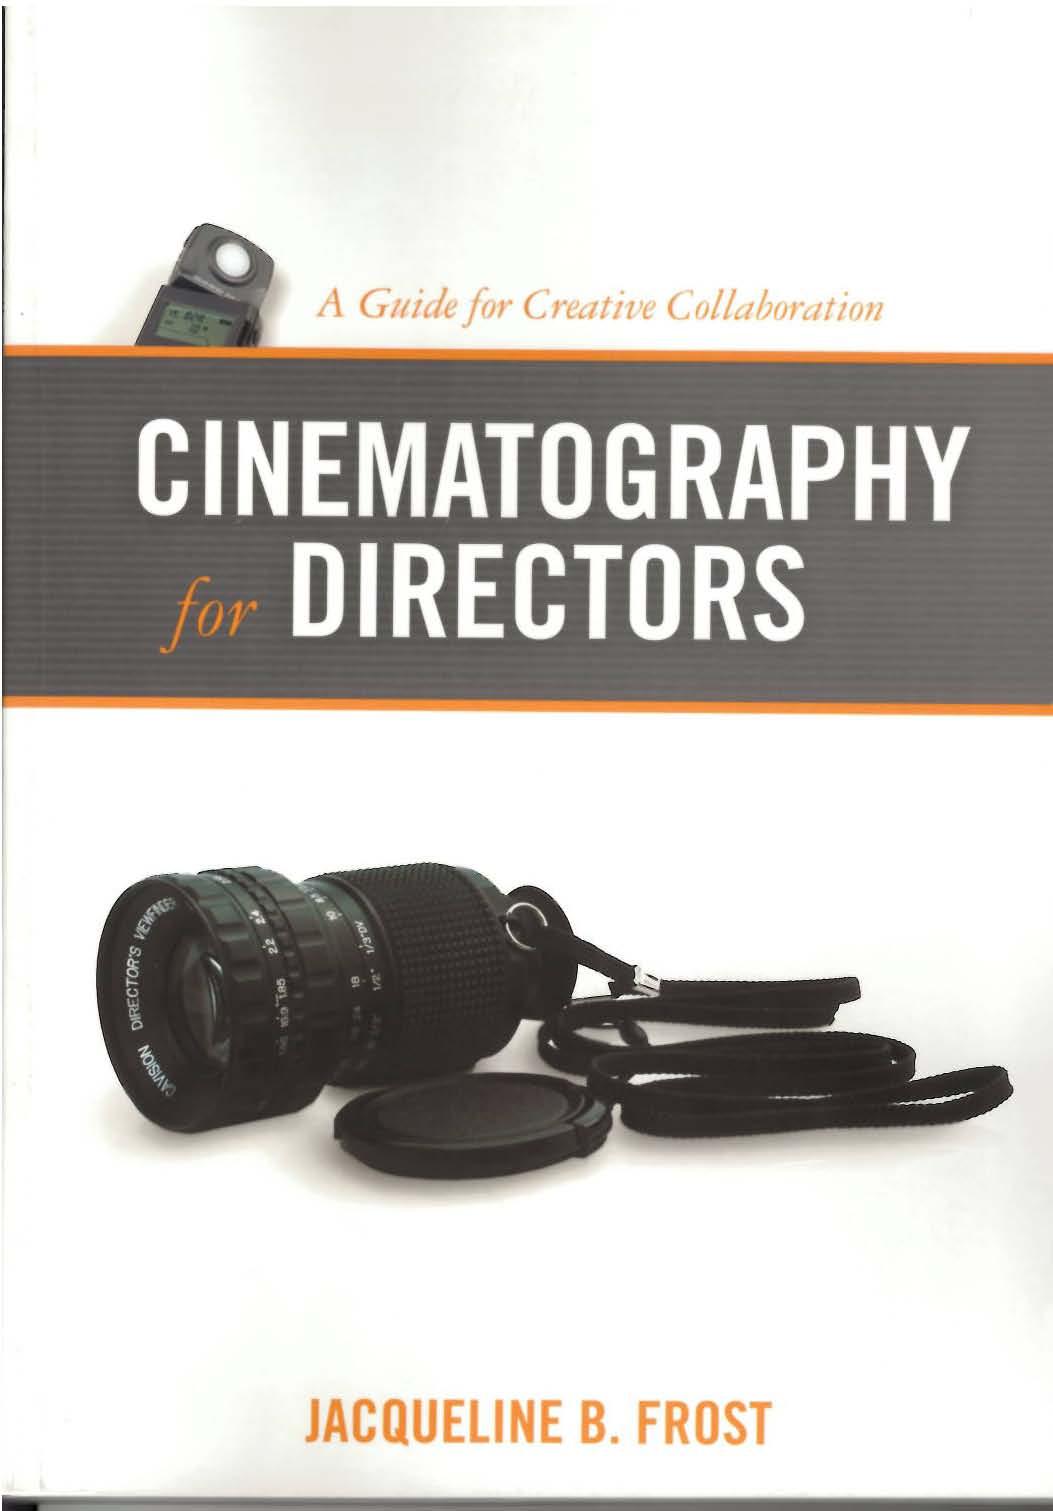 201505012 - Cinematography for directors1.jpg